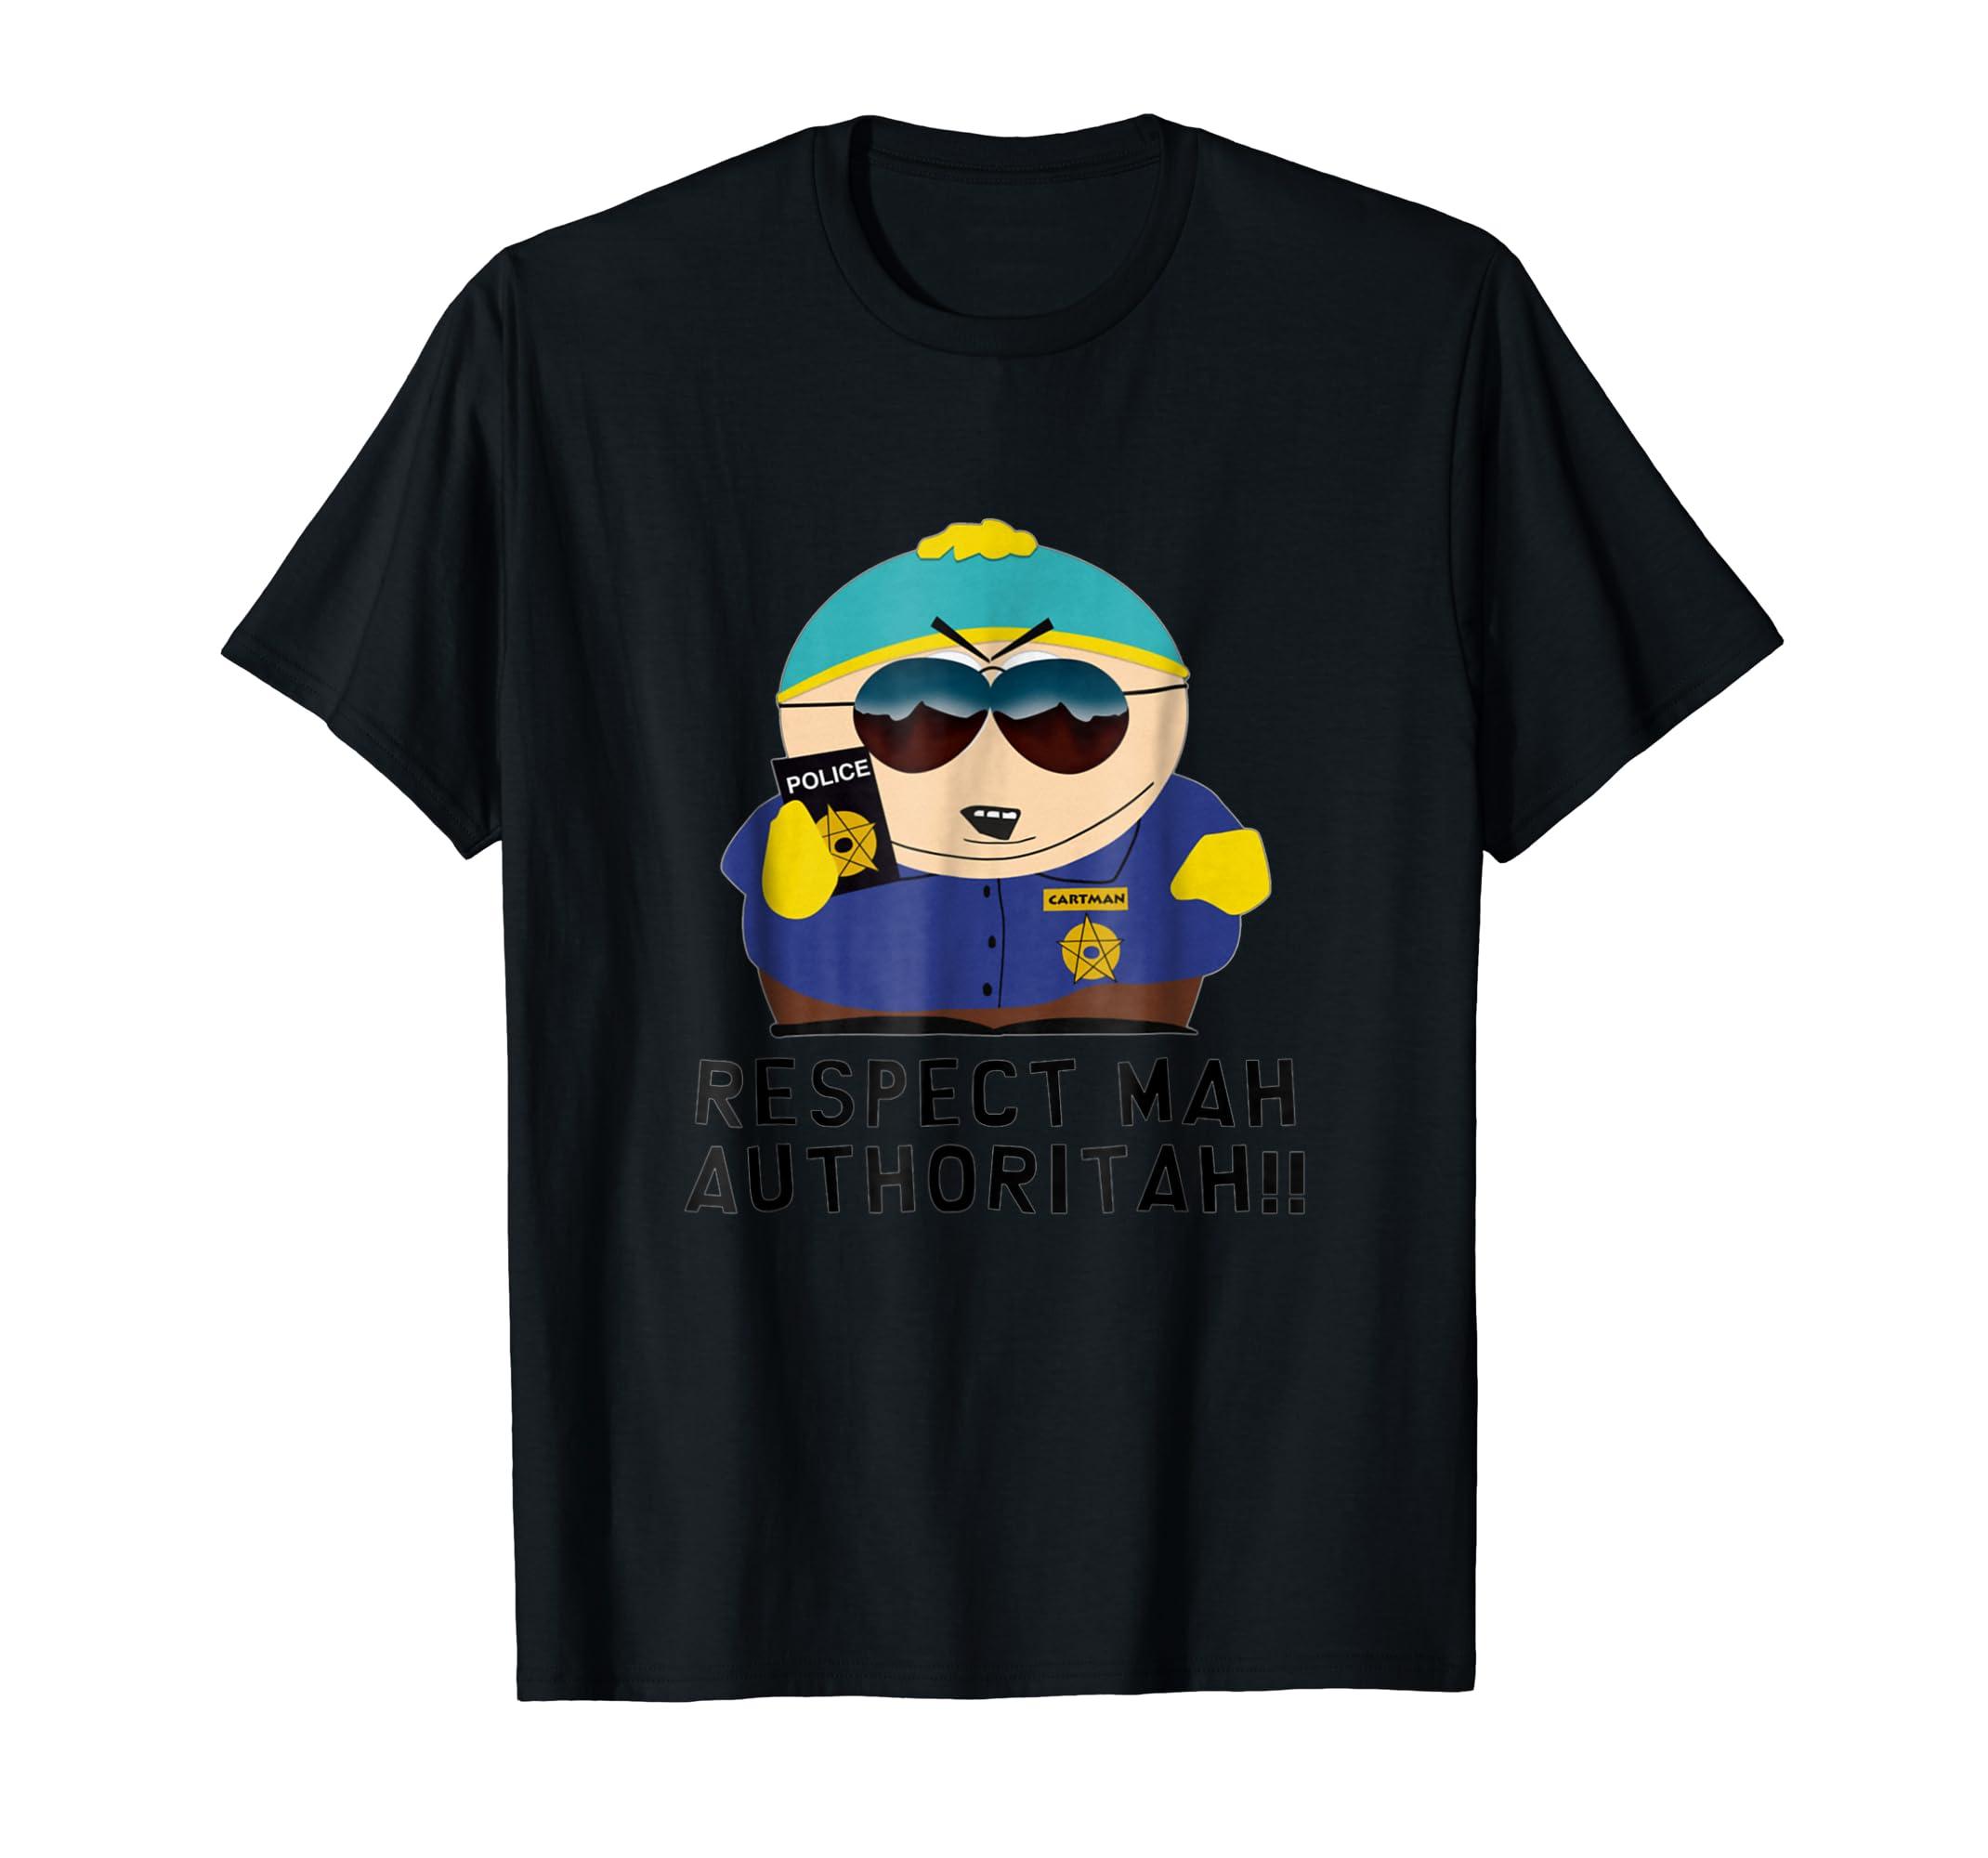 Cartman RESPECT MAH AUTHORITAH shirt-Men's T-Shirt-Black